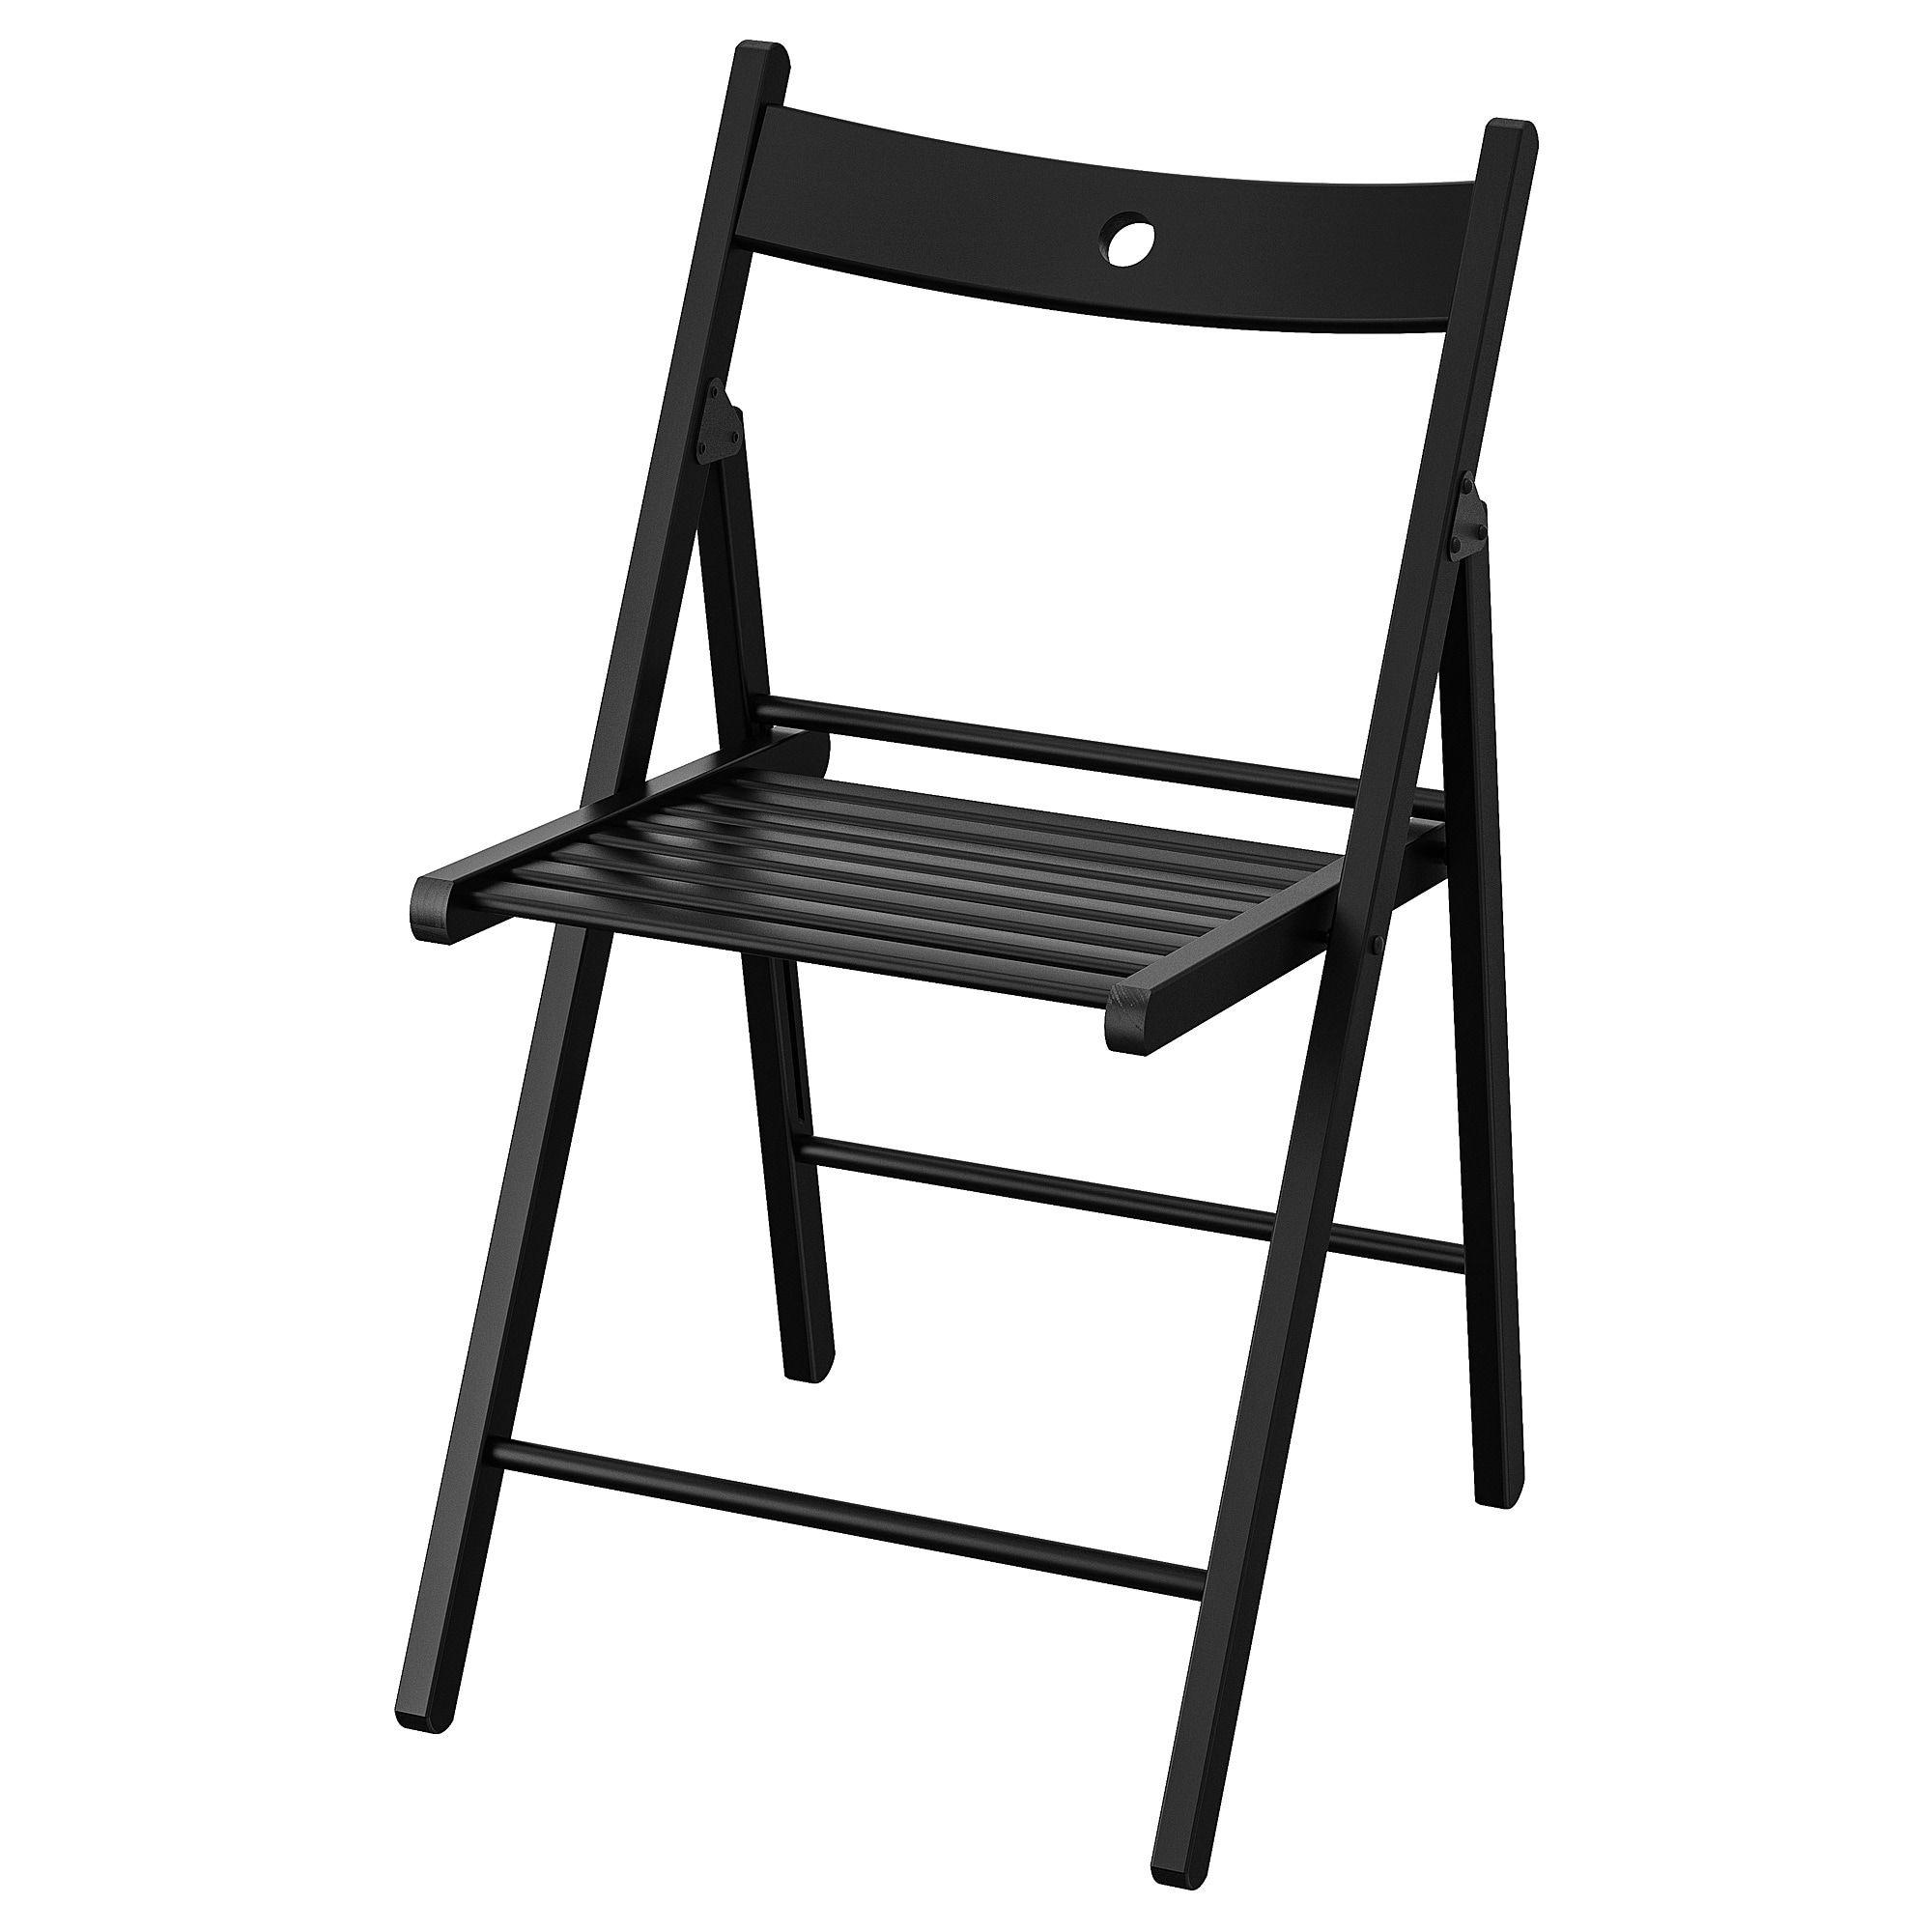 Ikea Terje Black Folding Chair Ikea Dining Chair Folding Chair